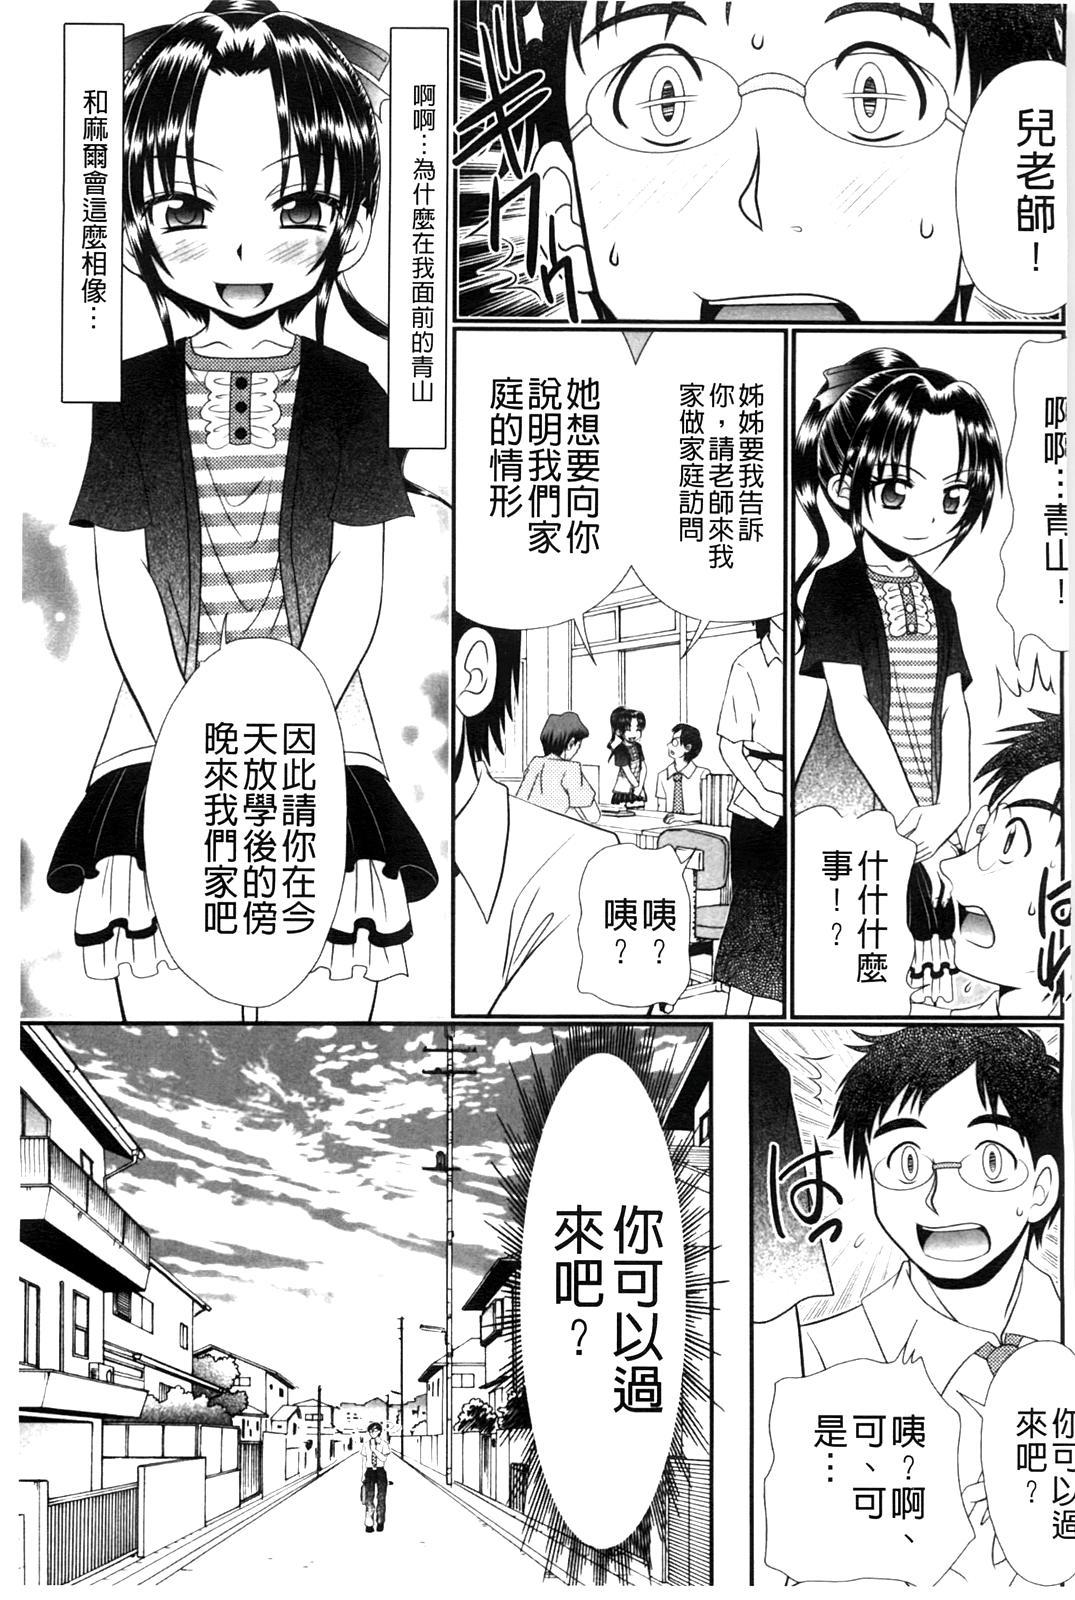 Higyaku Kyoushitsu 137